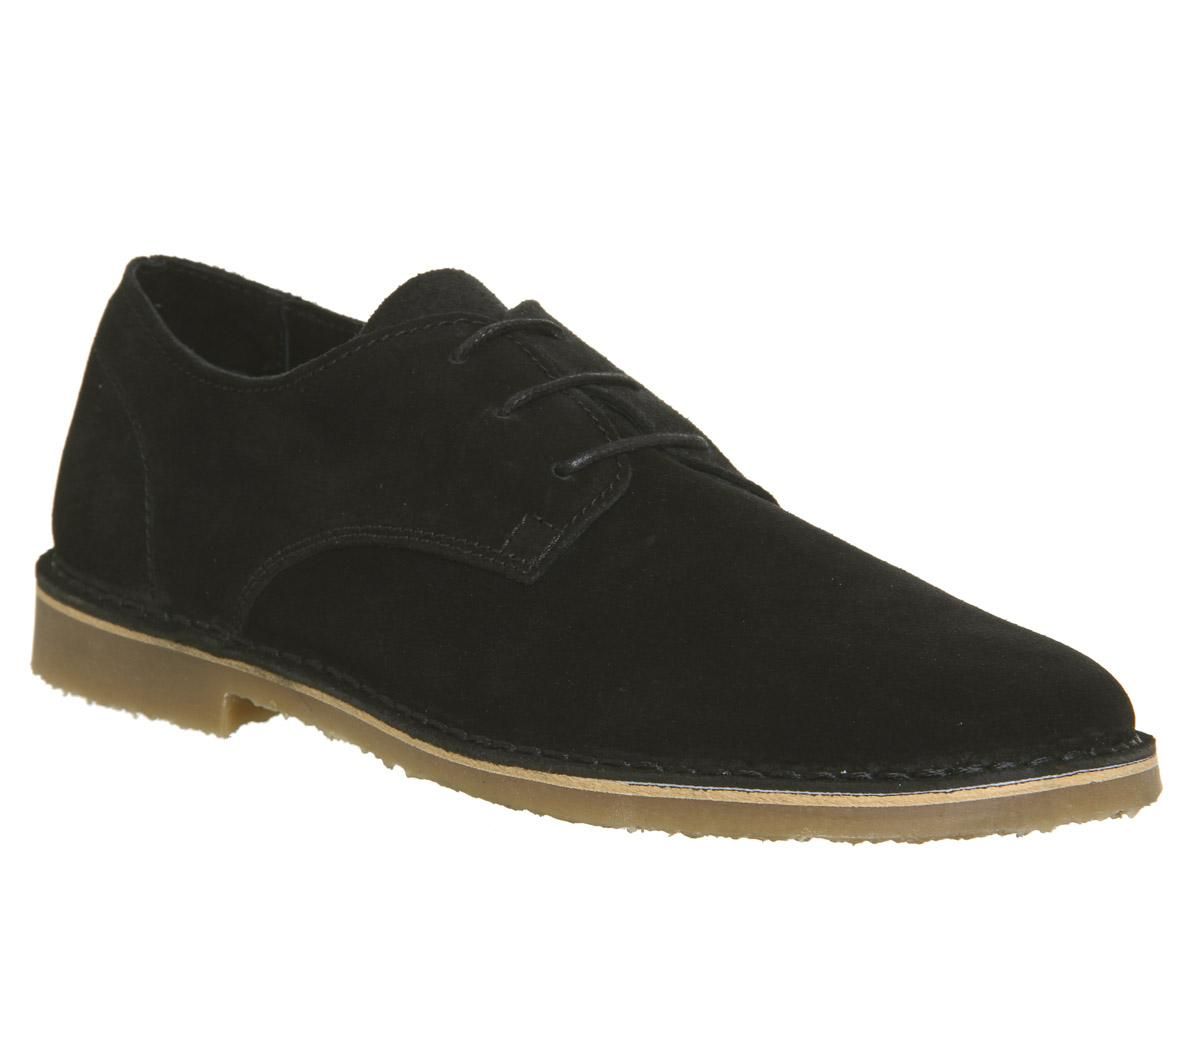 Inferno Desert Shoes